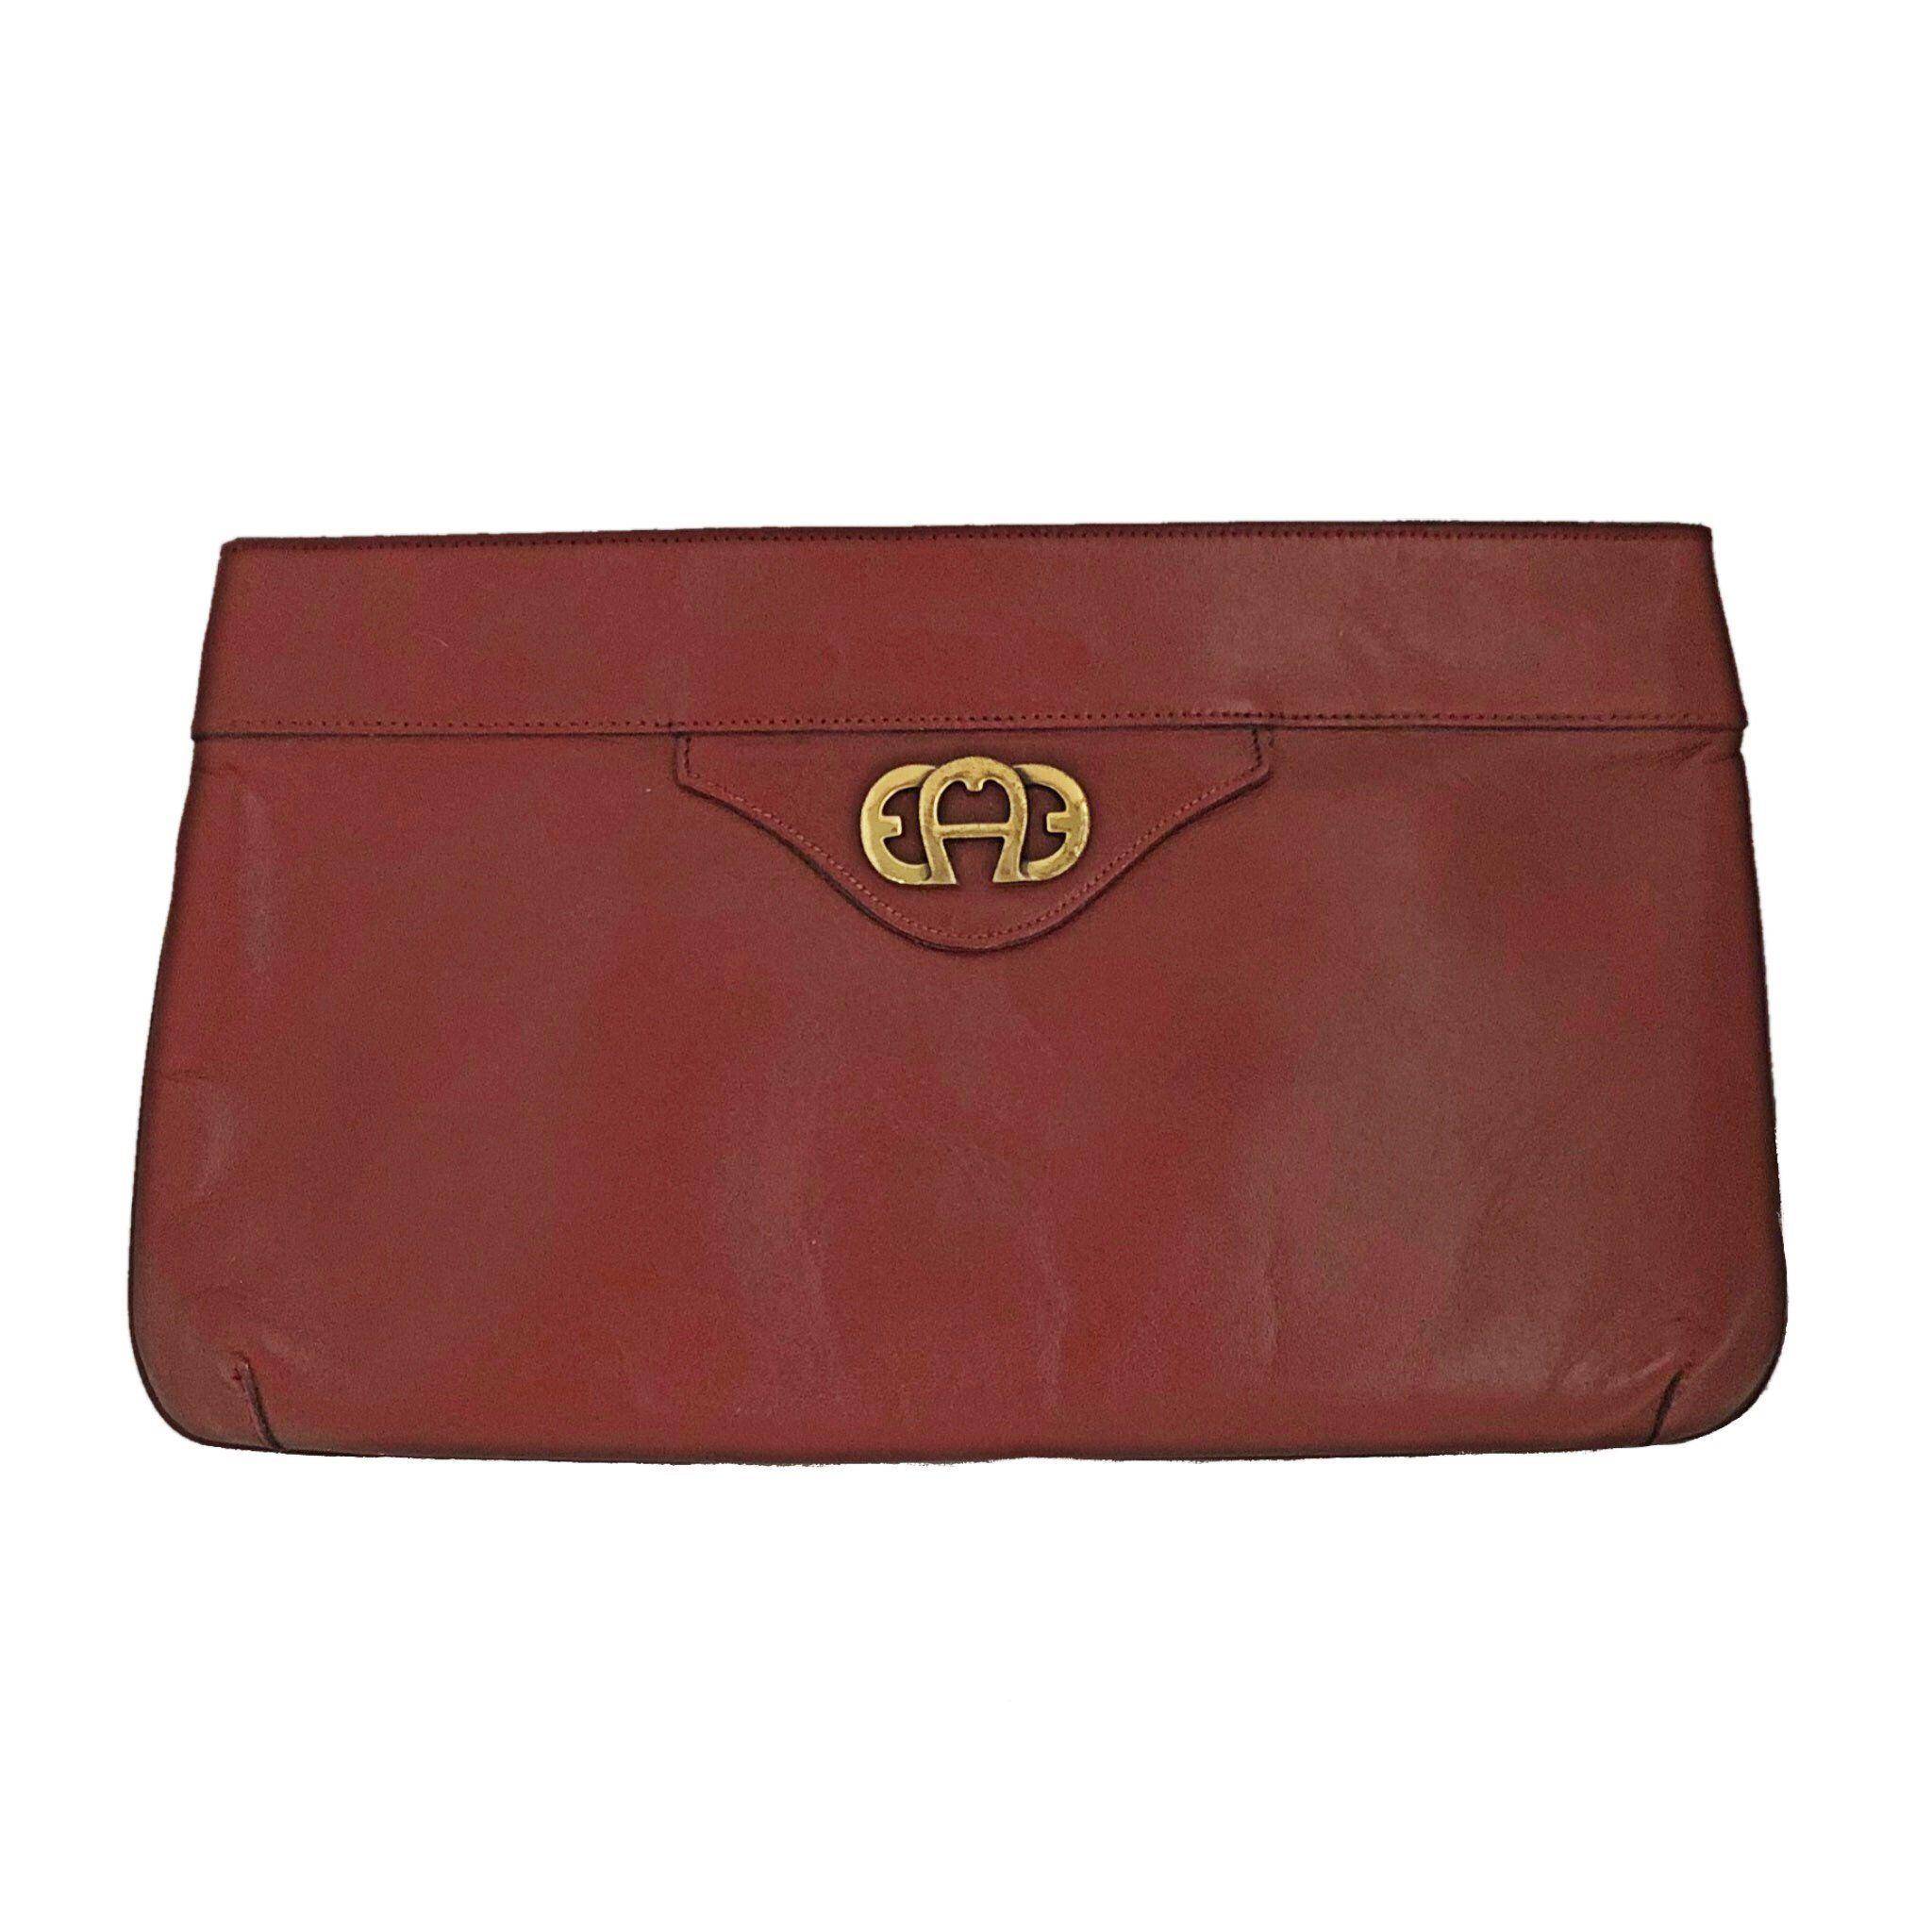 5a4c553eeb483 New to my #etsy shop: Vintage Etienne Aigner brown leather clutch handbag,  purse